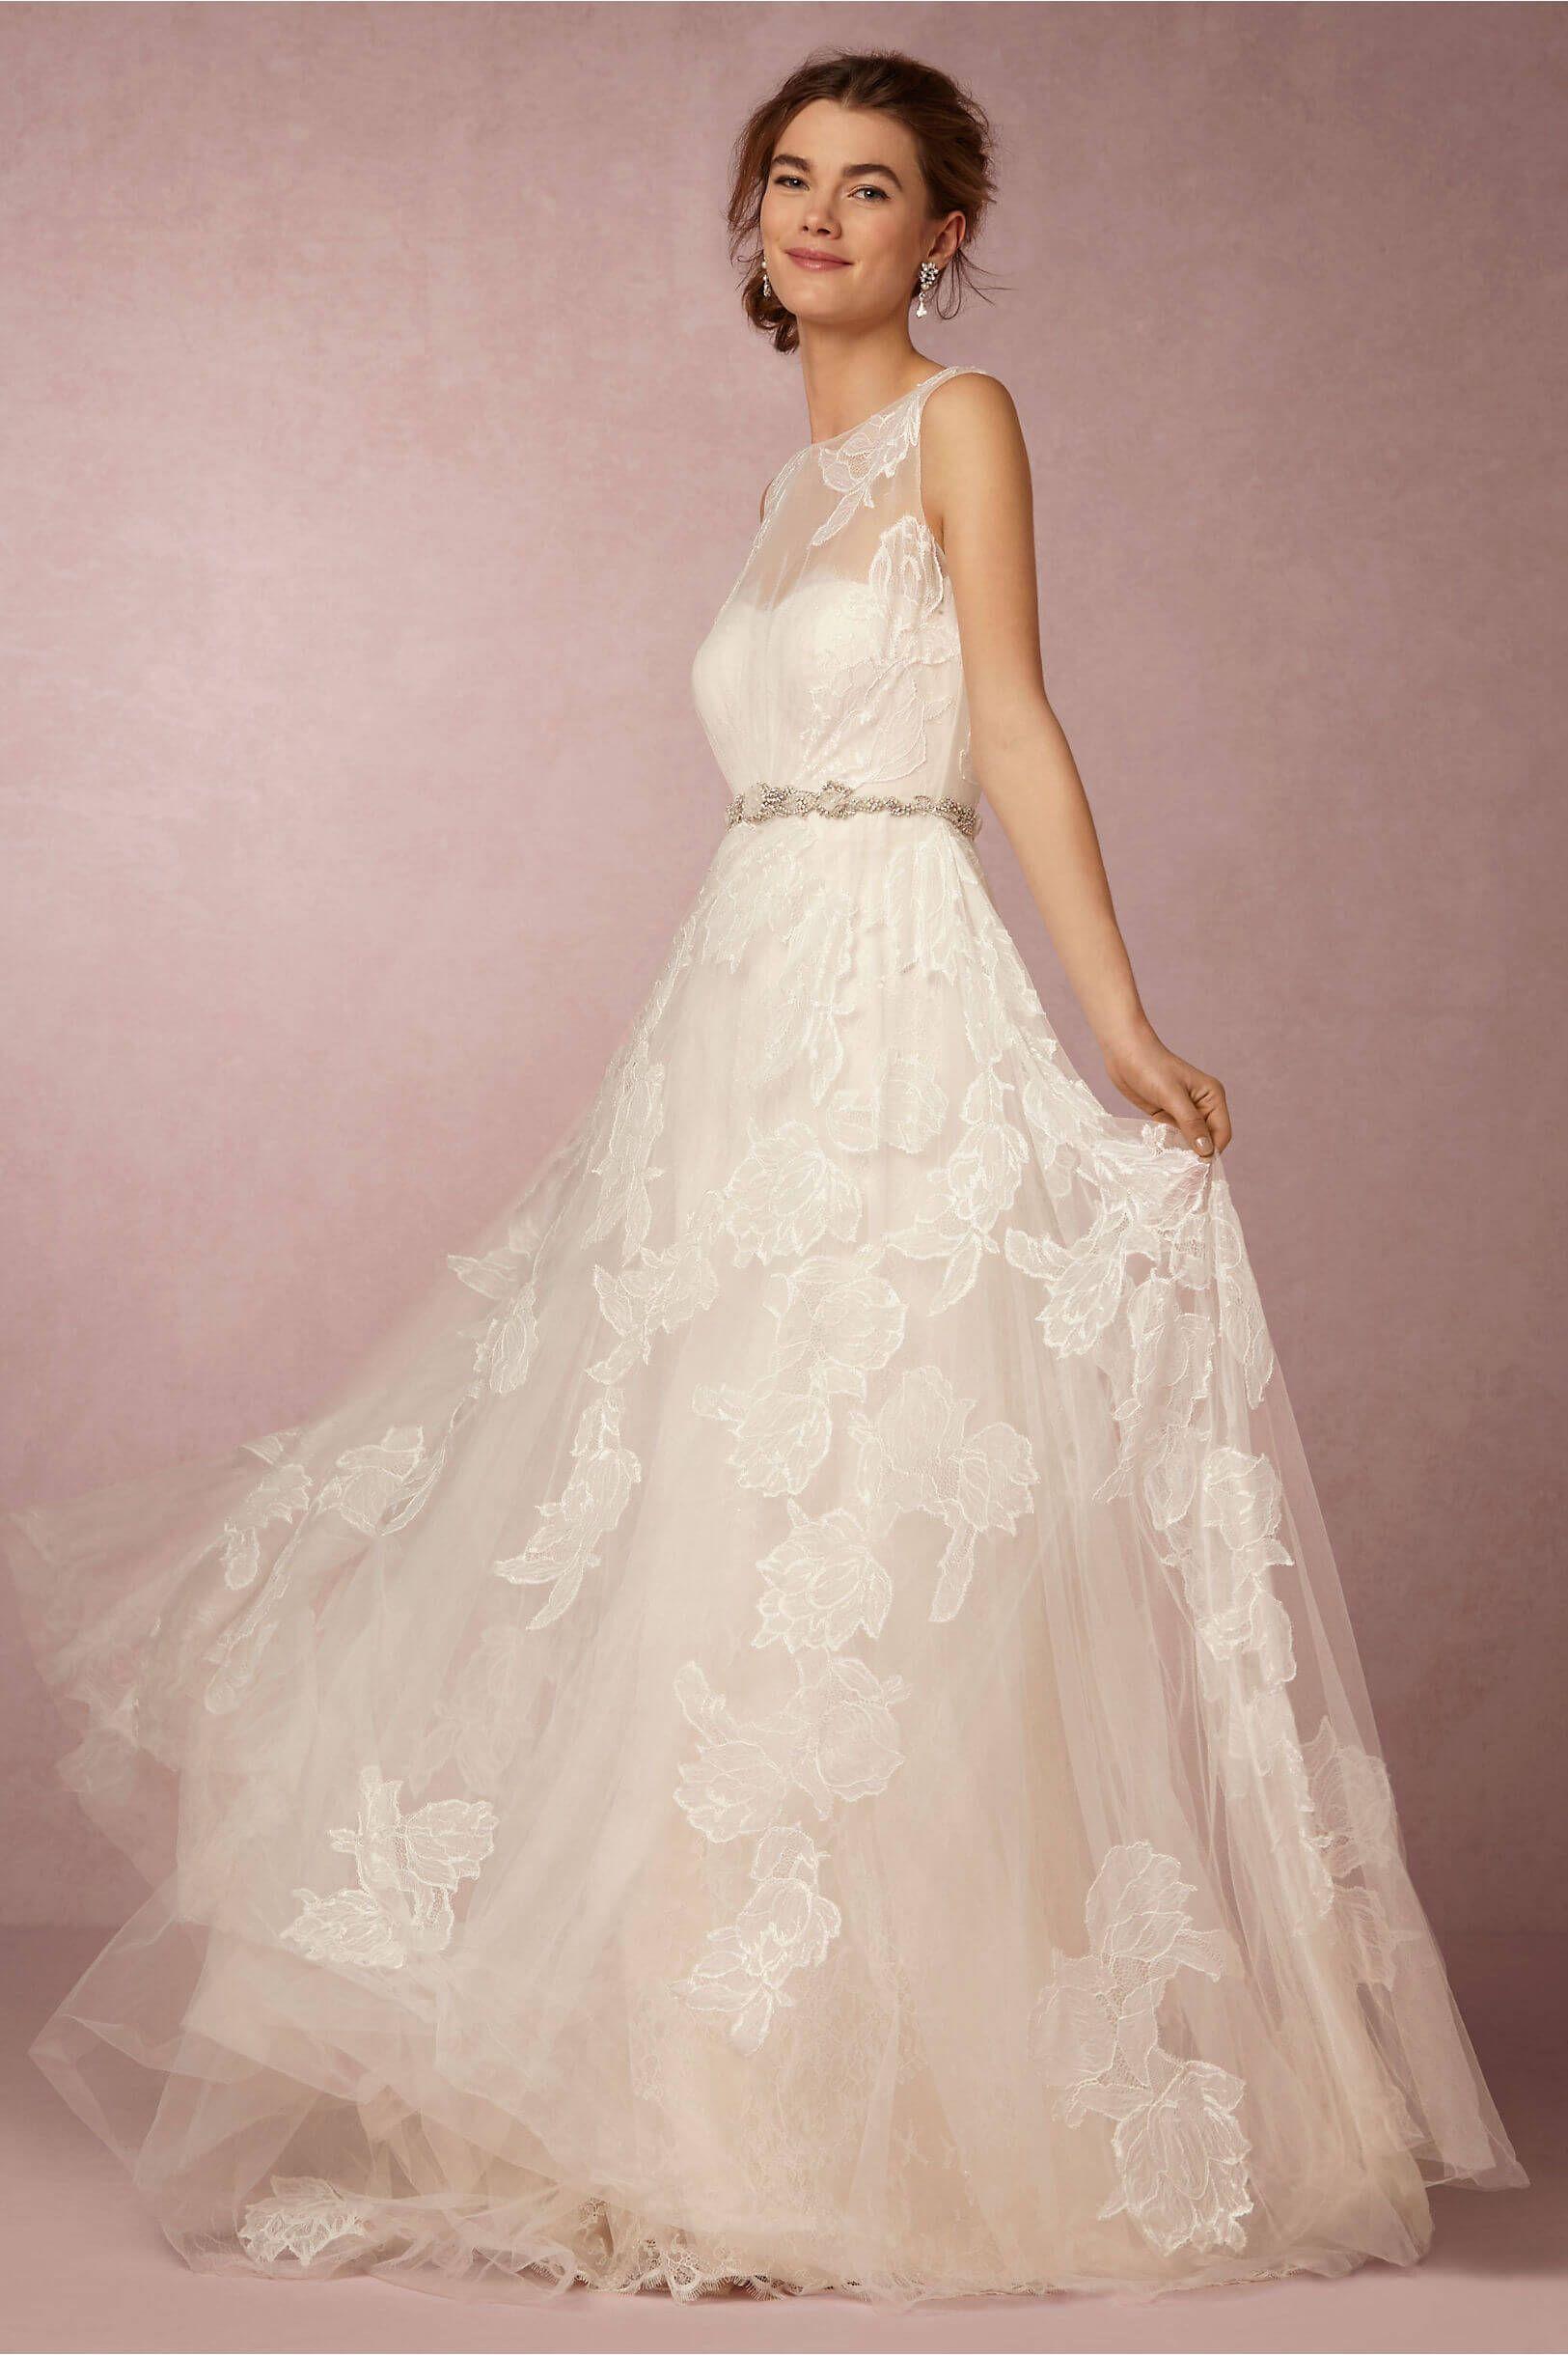 High neck wedding dresses  Most Gorgeous High Neck Wedding Dresses  Gowns Wedding dress and